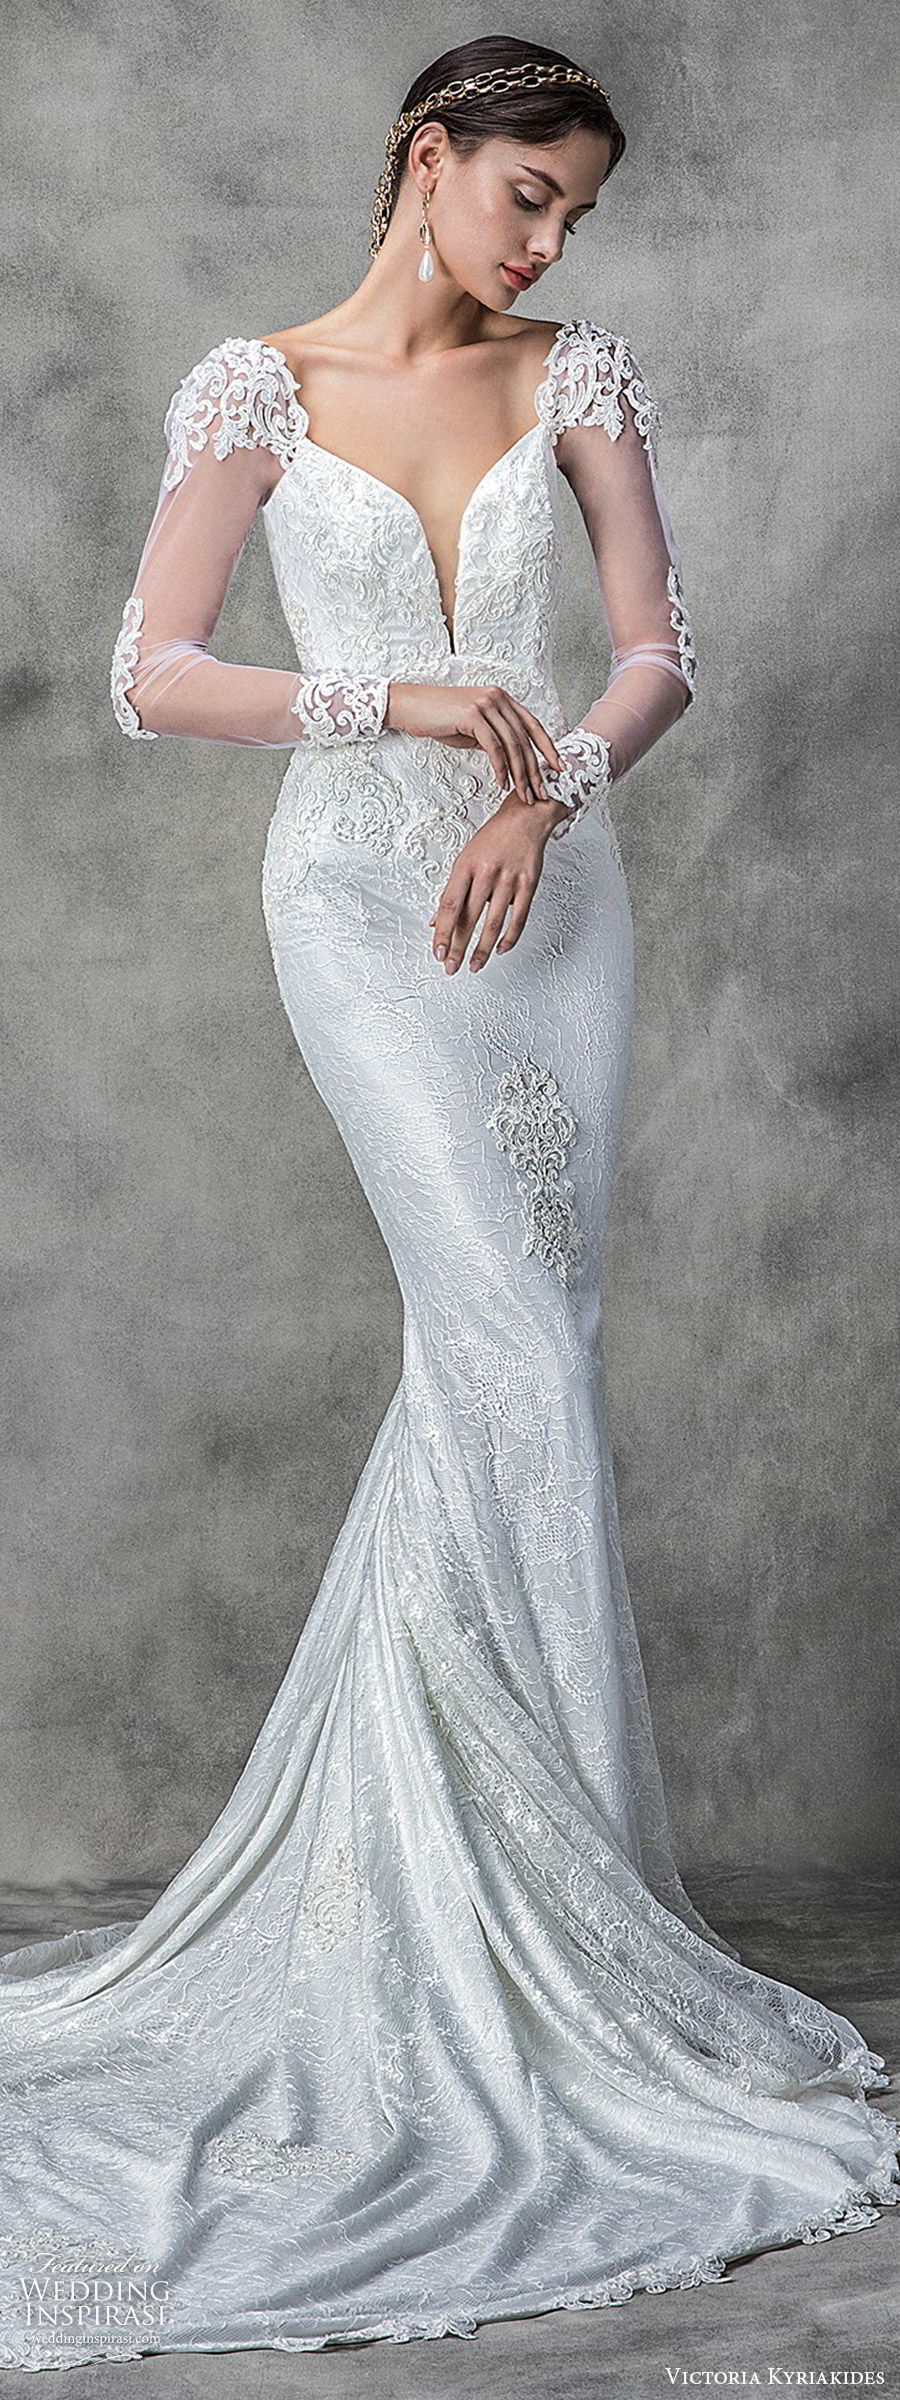 victoria kyriakides spring 2020 bridal illusion long sleeves split sweetheart neckline fully embellished lace sheath wedding dress (13) elegant chapel train lv